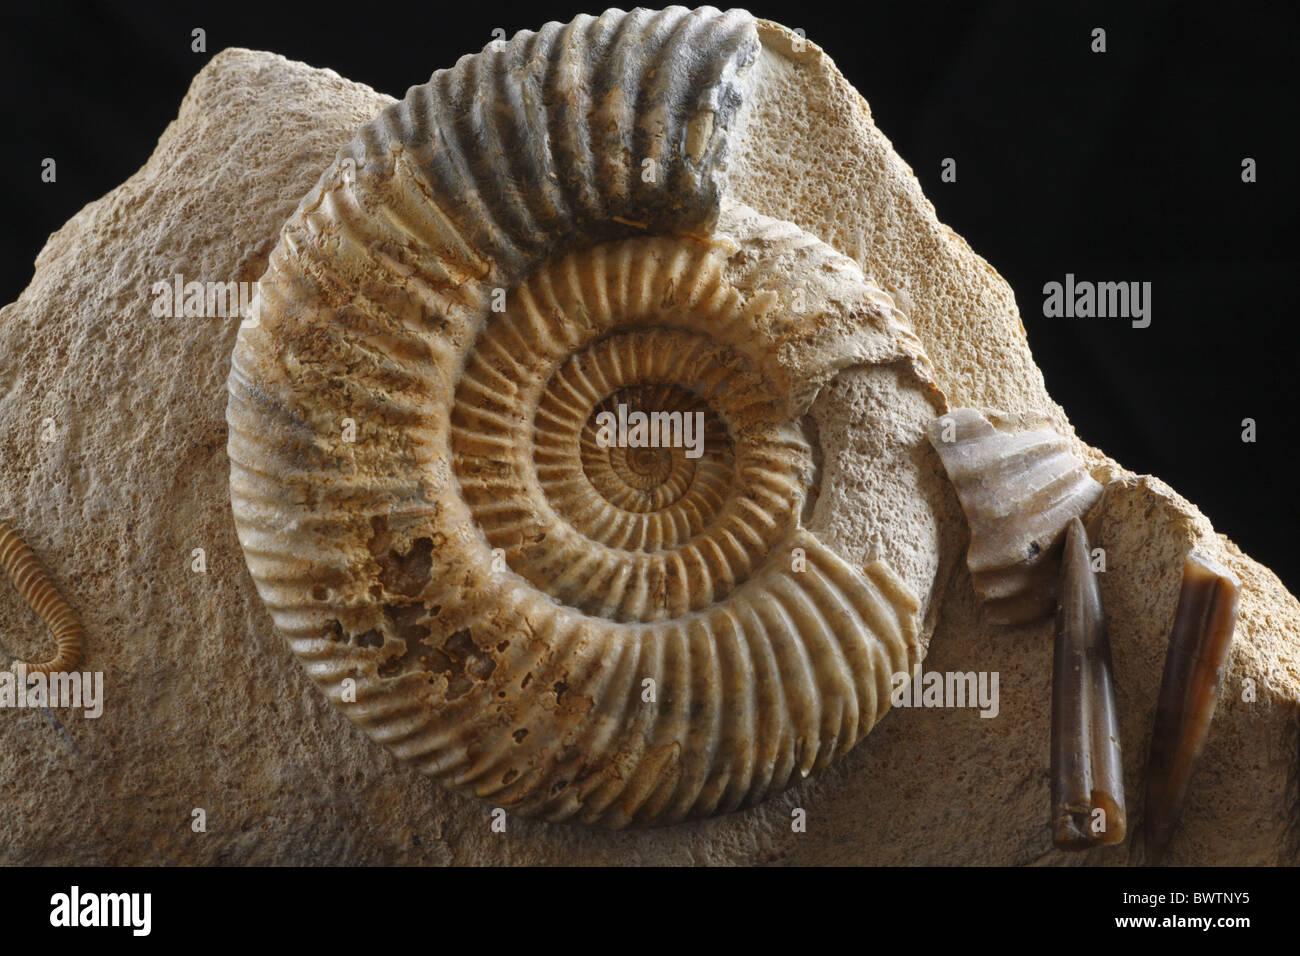 fossil fossilized ammonite jurassic england english Parkinsonia mollusc shell fossilization invertebrate rock europe - Stock Image